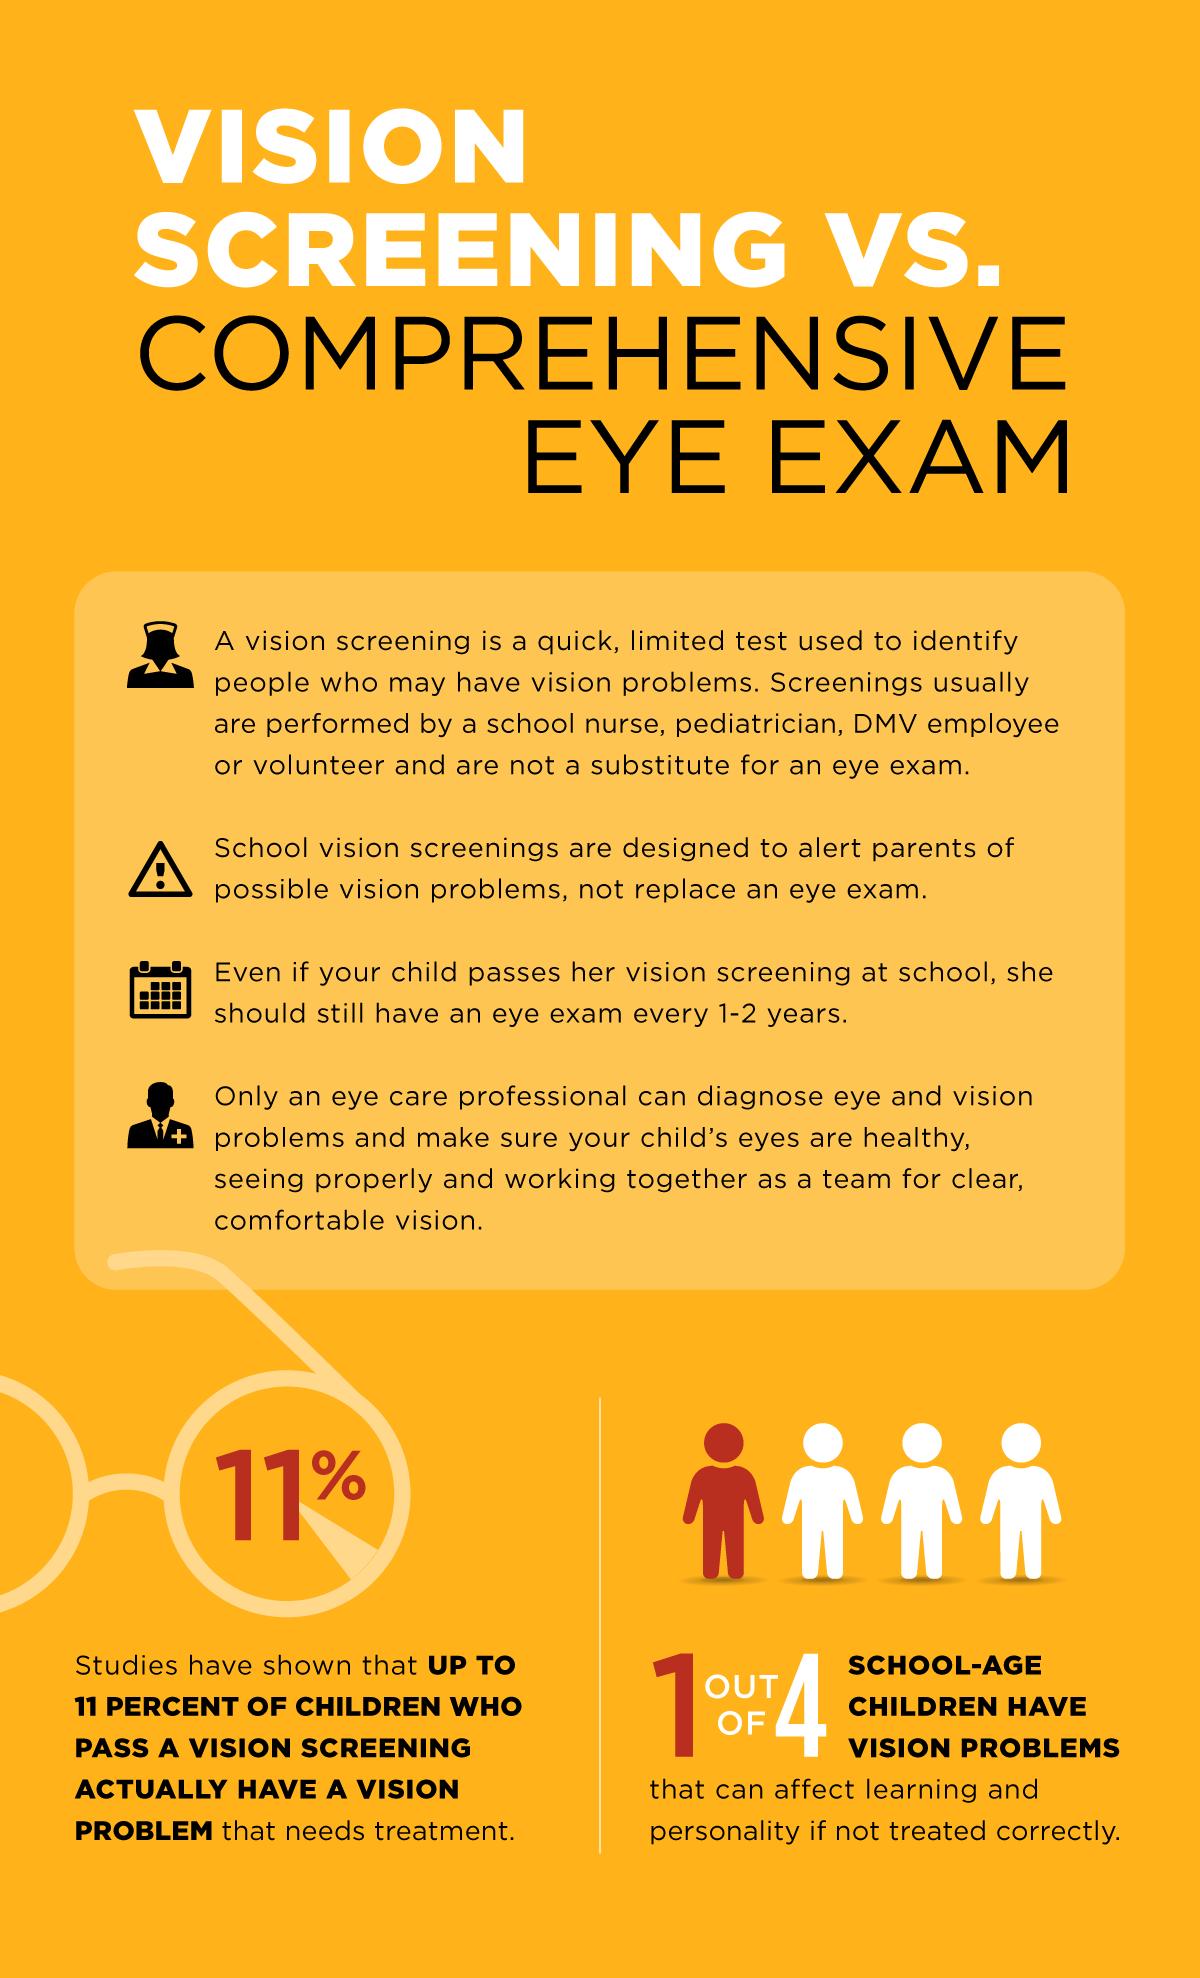 Vision Screenings vs. Eye Exams Why Are Eye Exams